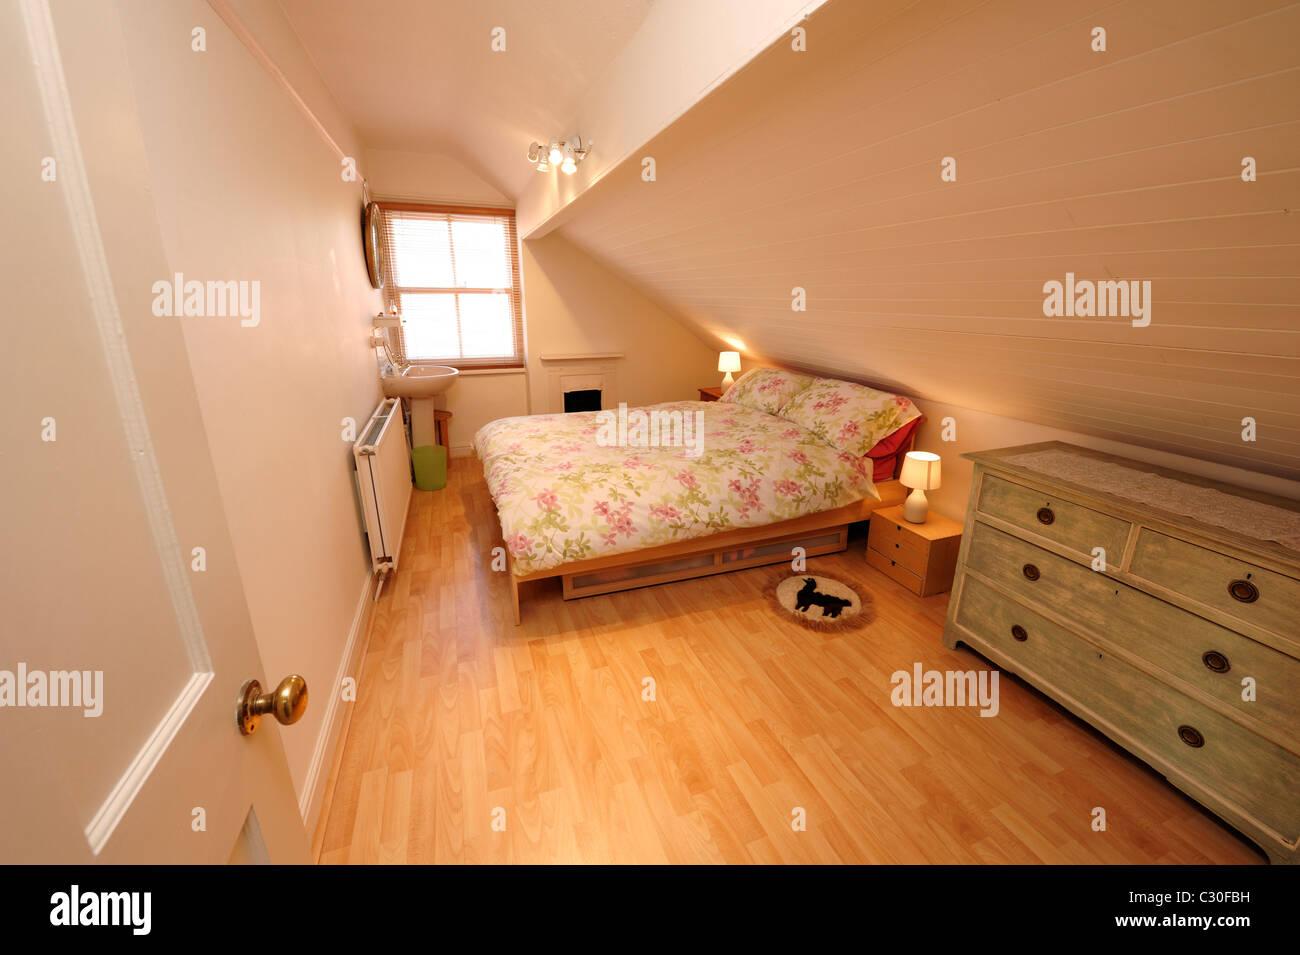 Loft moderne chambre de conversion Photo Stock